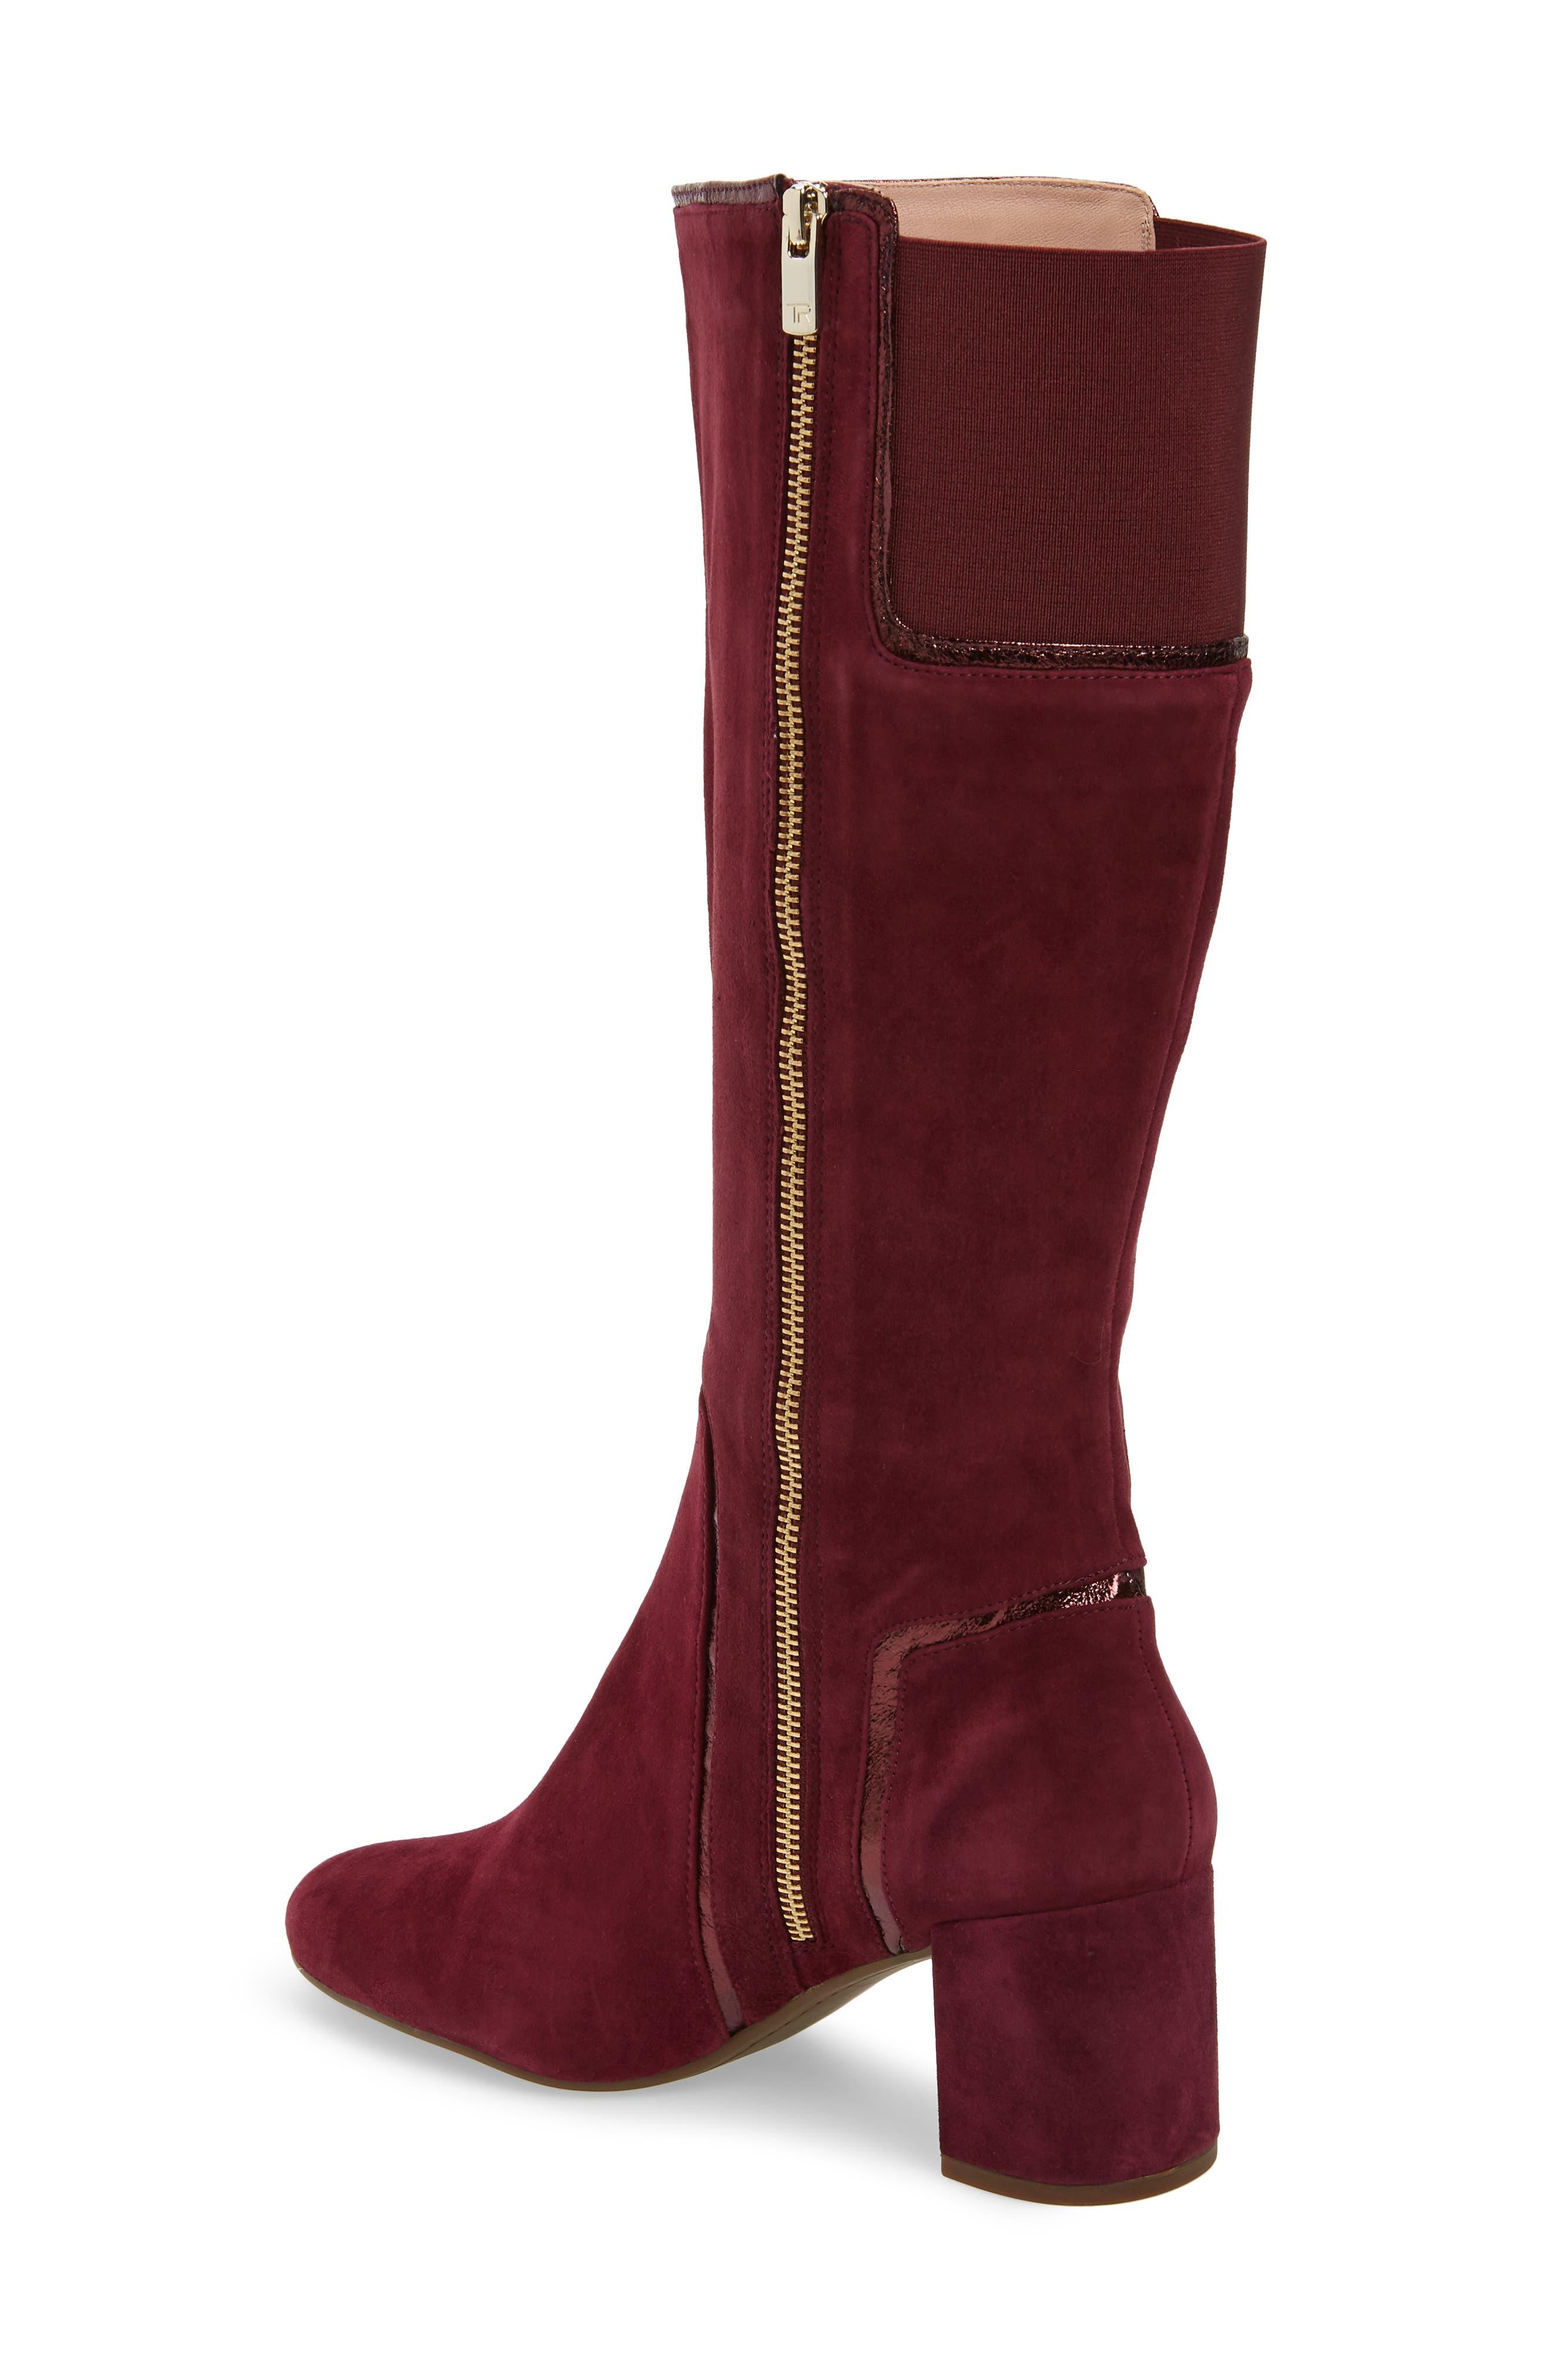 TARYN ROSE, Charlee Knee High Boot, Alternate thumbnail 2, color, FIG SUEDE